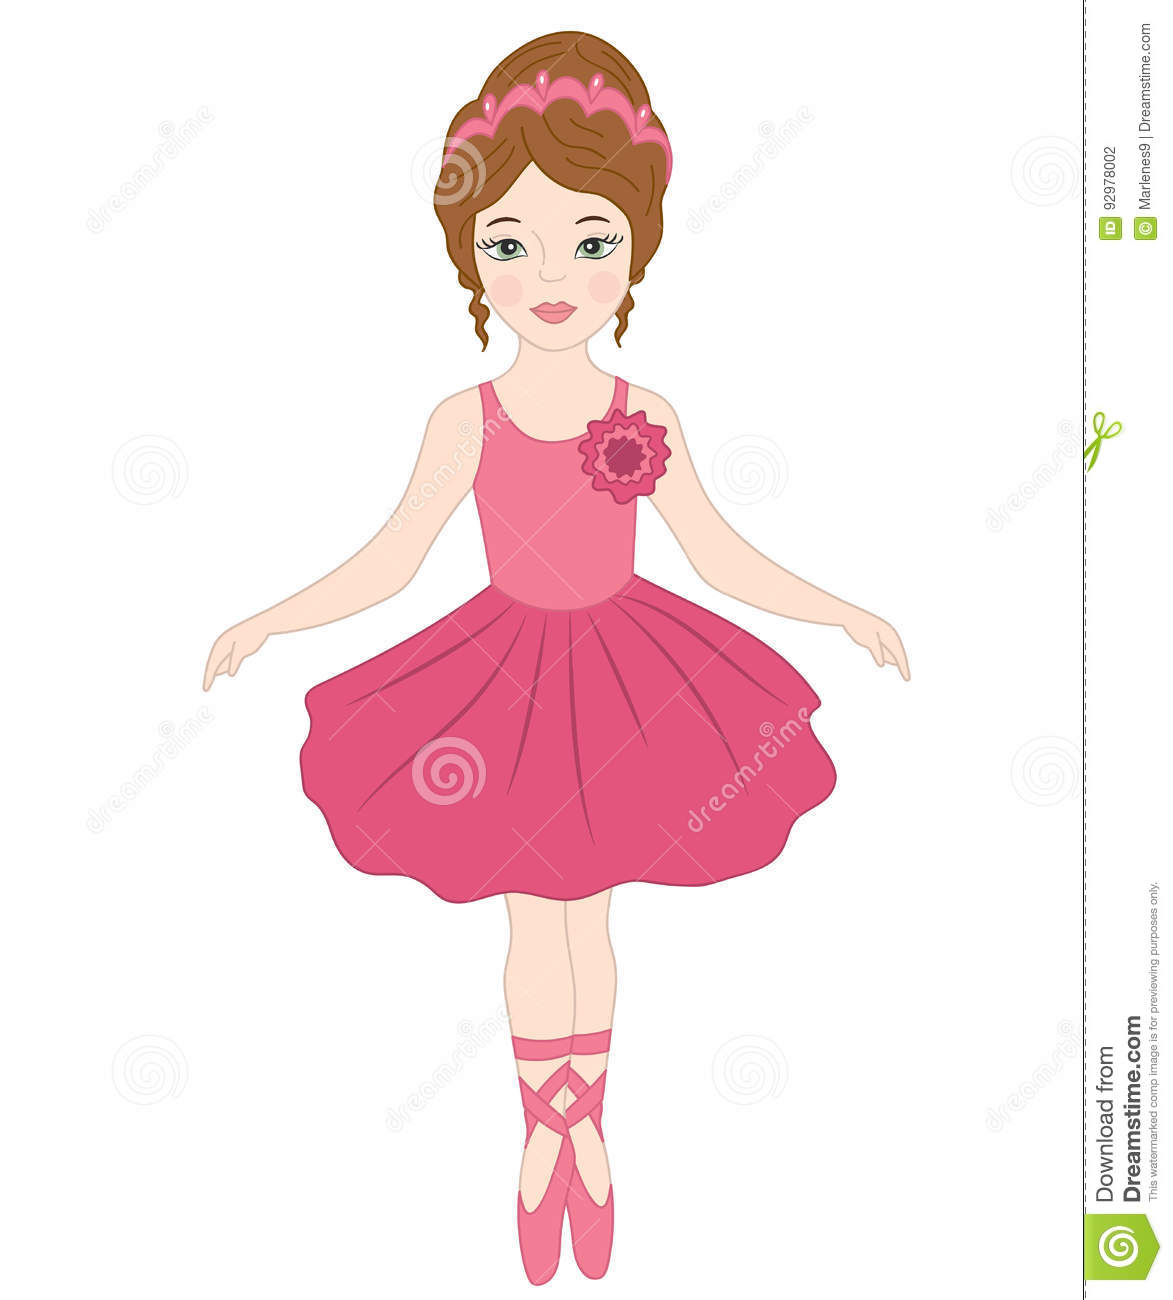 3043 Ballerina free clipart.